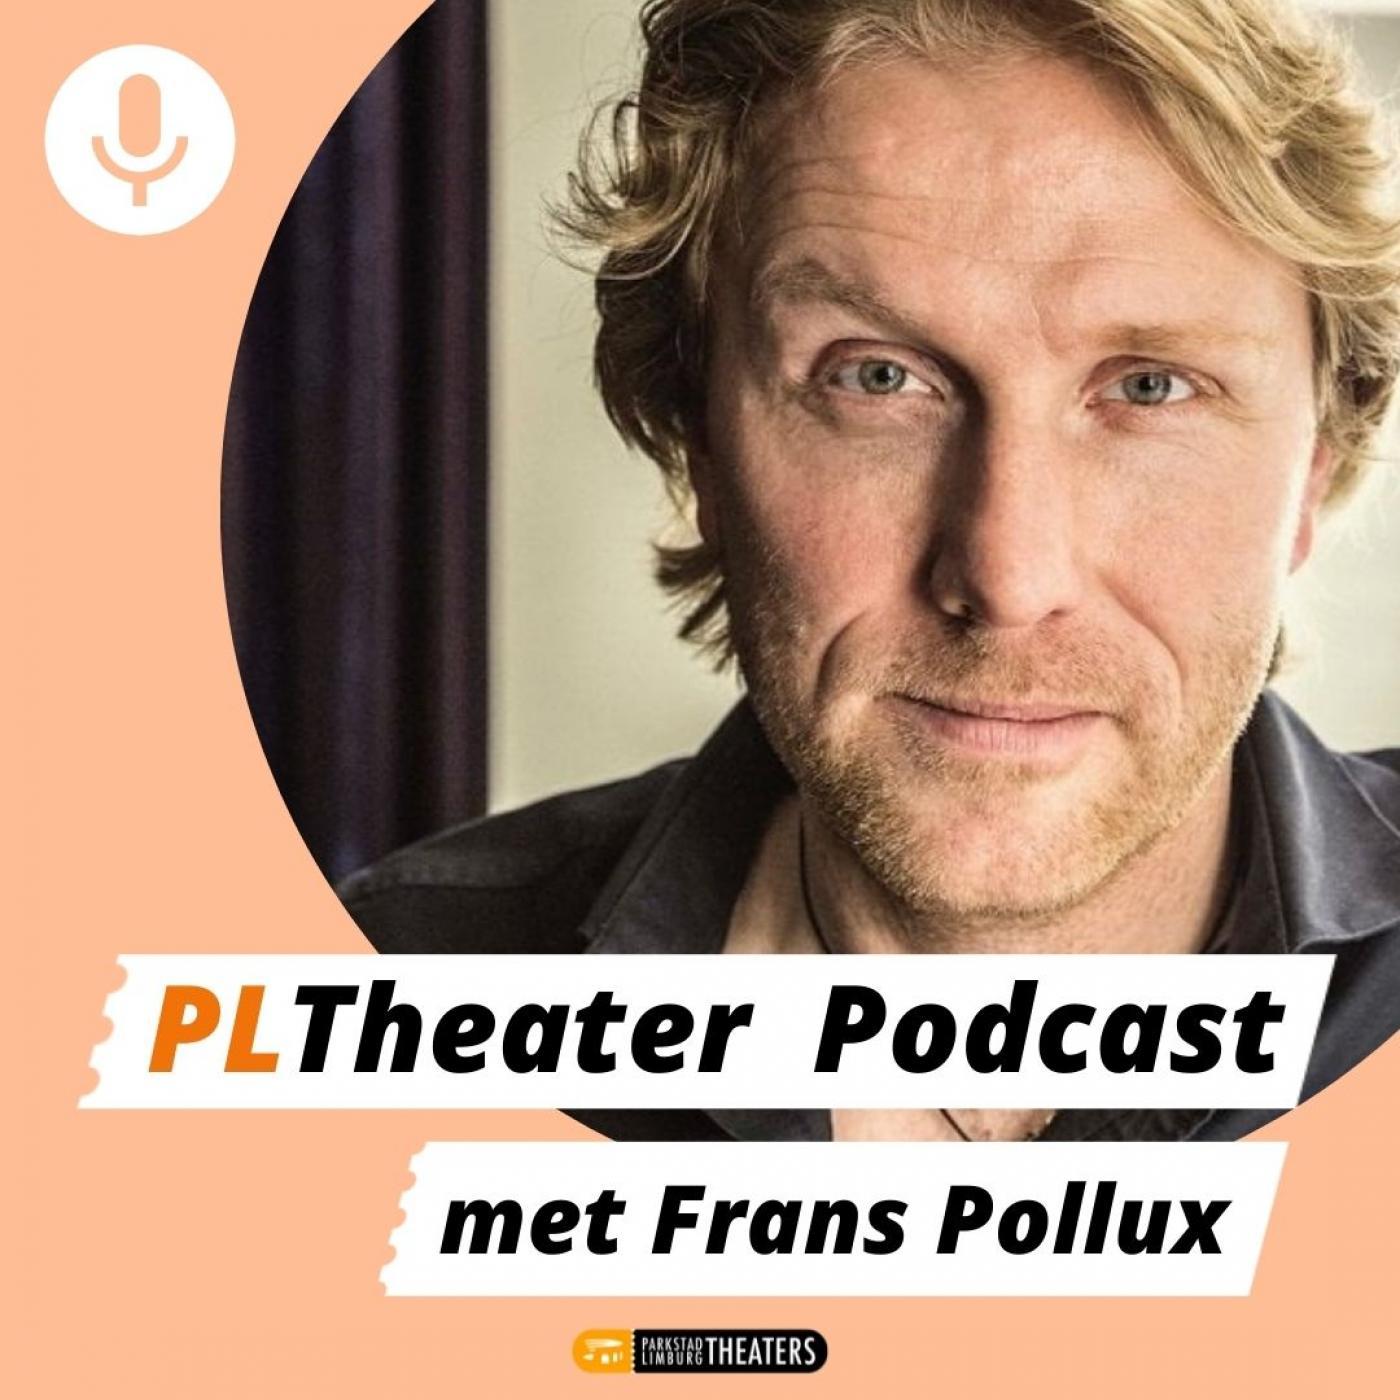 PLTheater Podcast met Frans Pollux logo